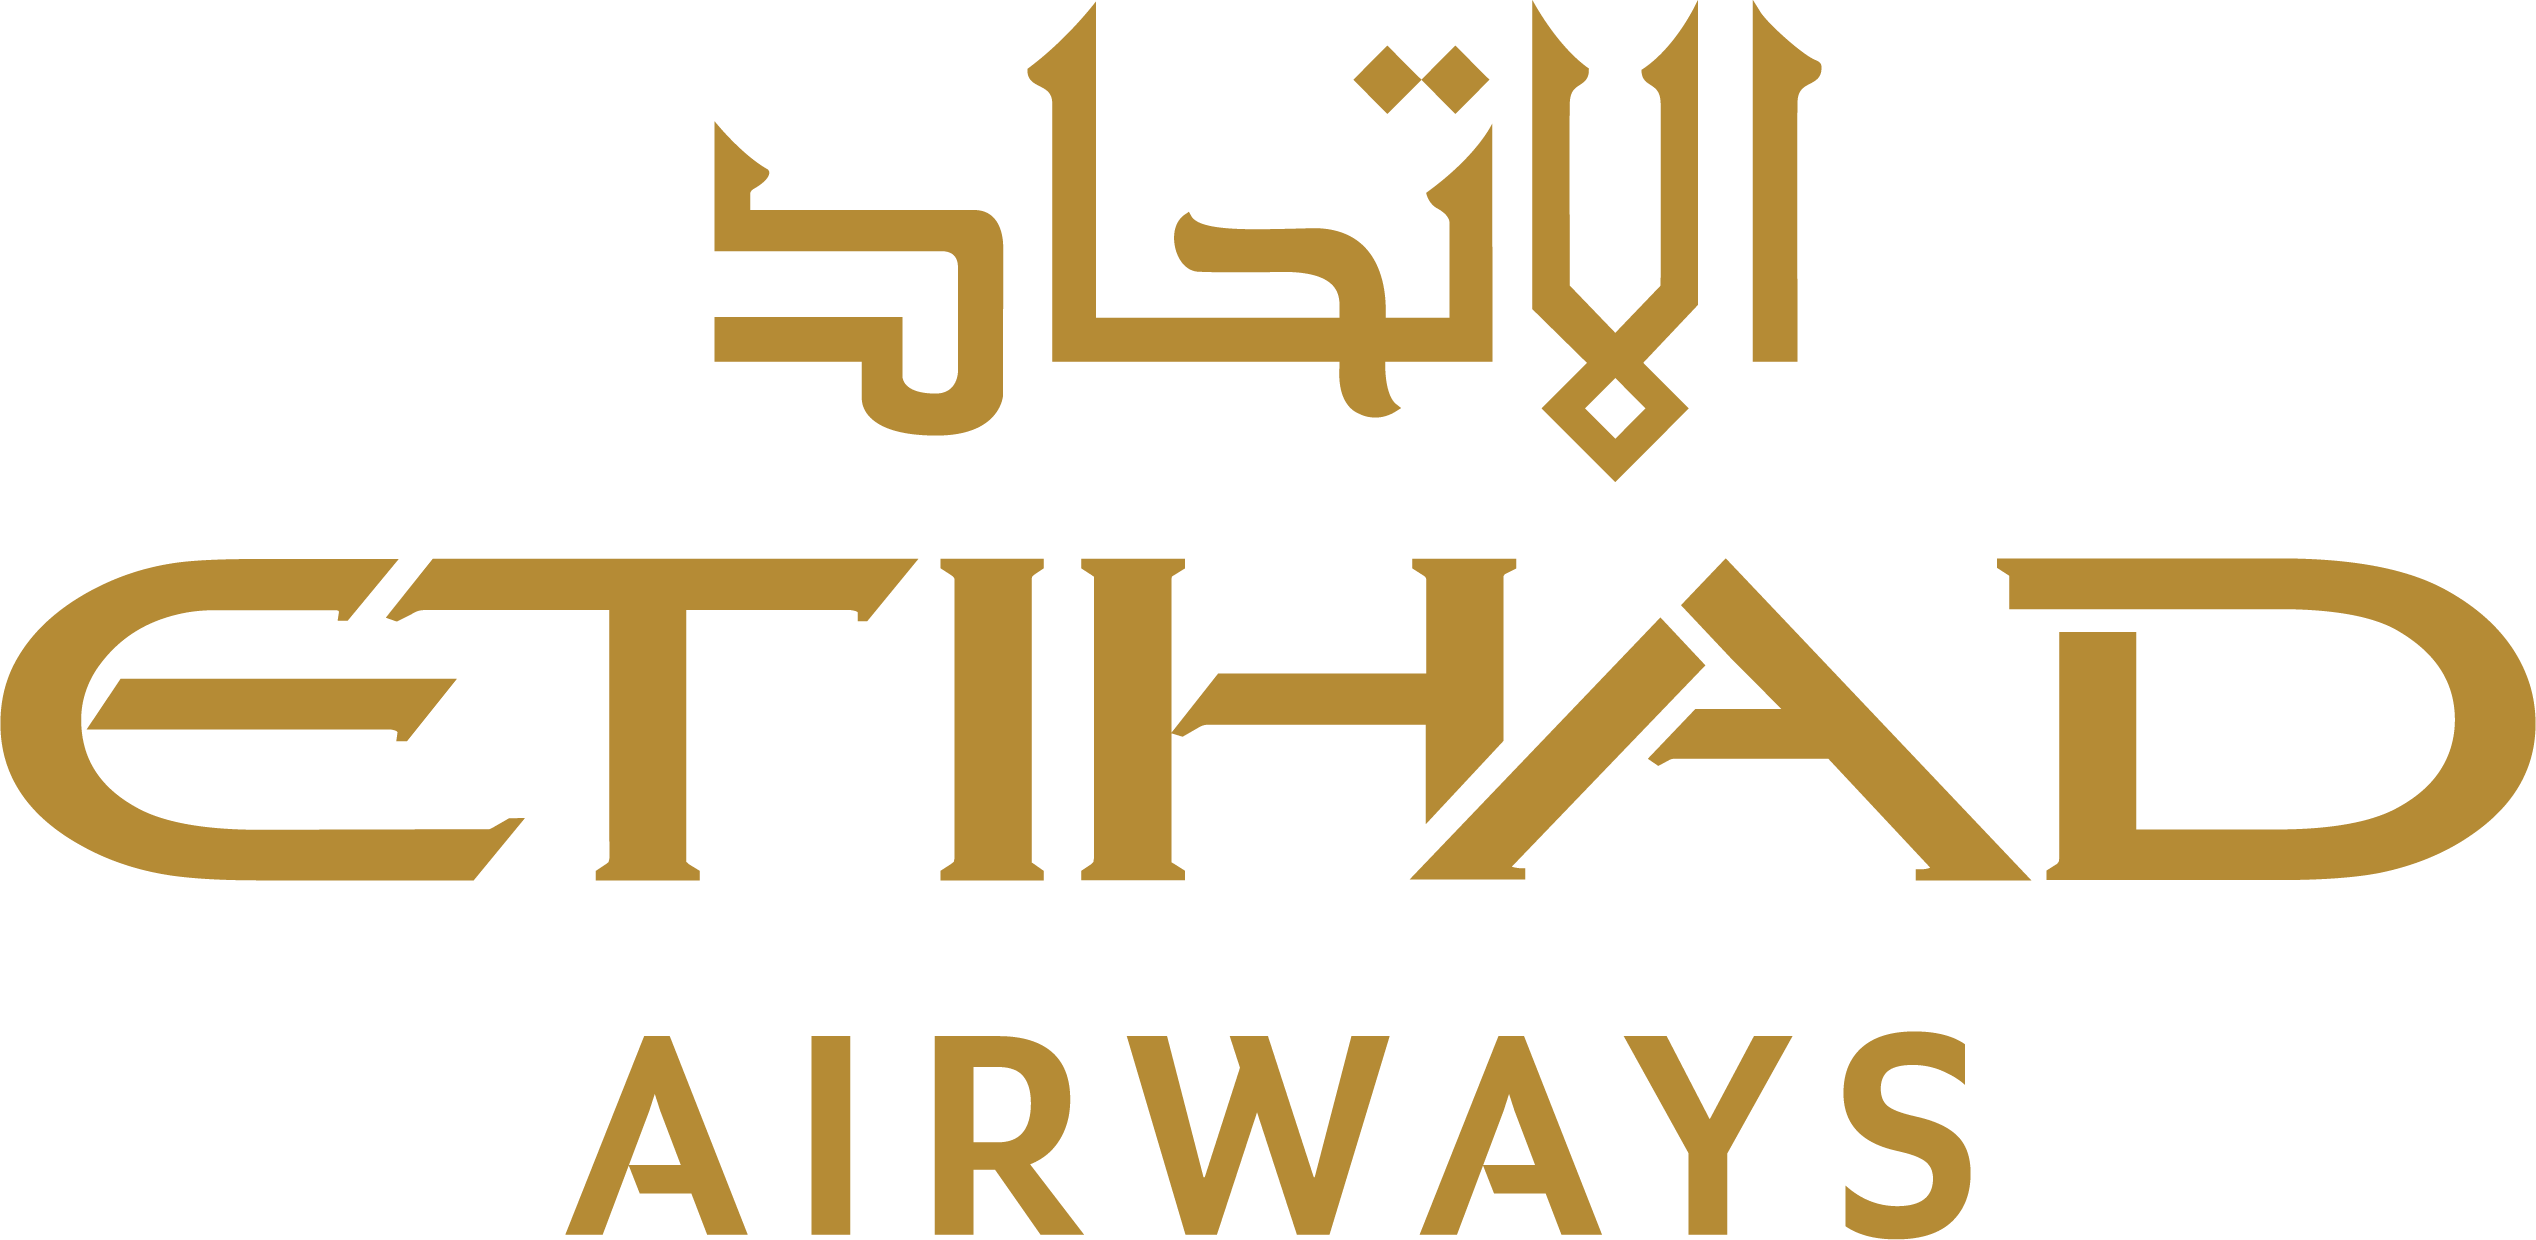 Etihad Airways Promotions & Discounts